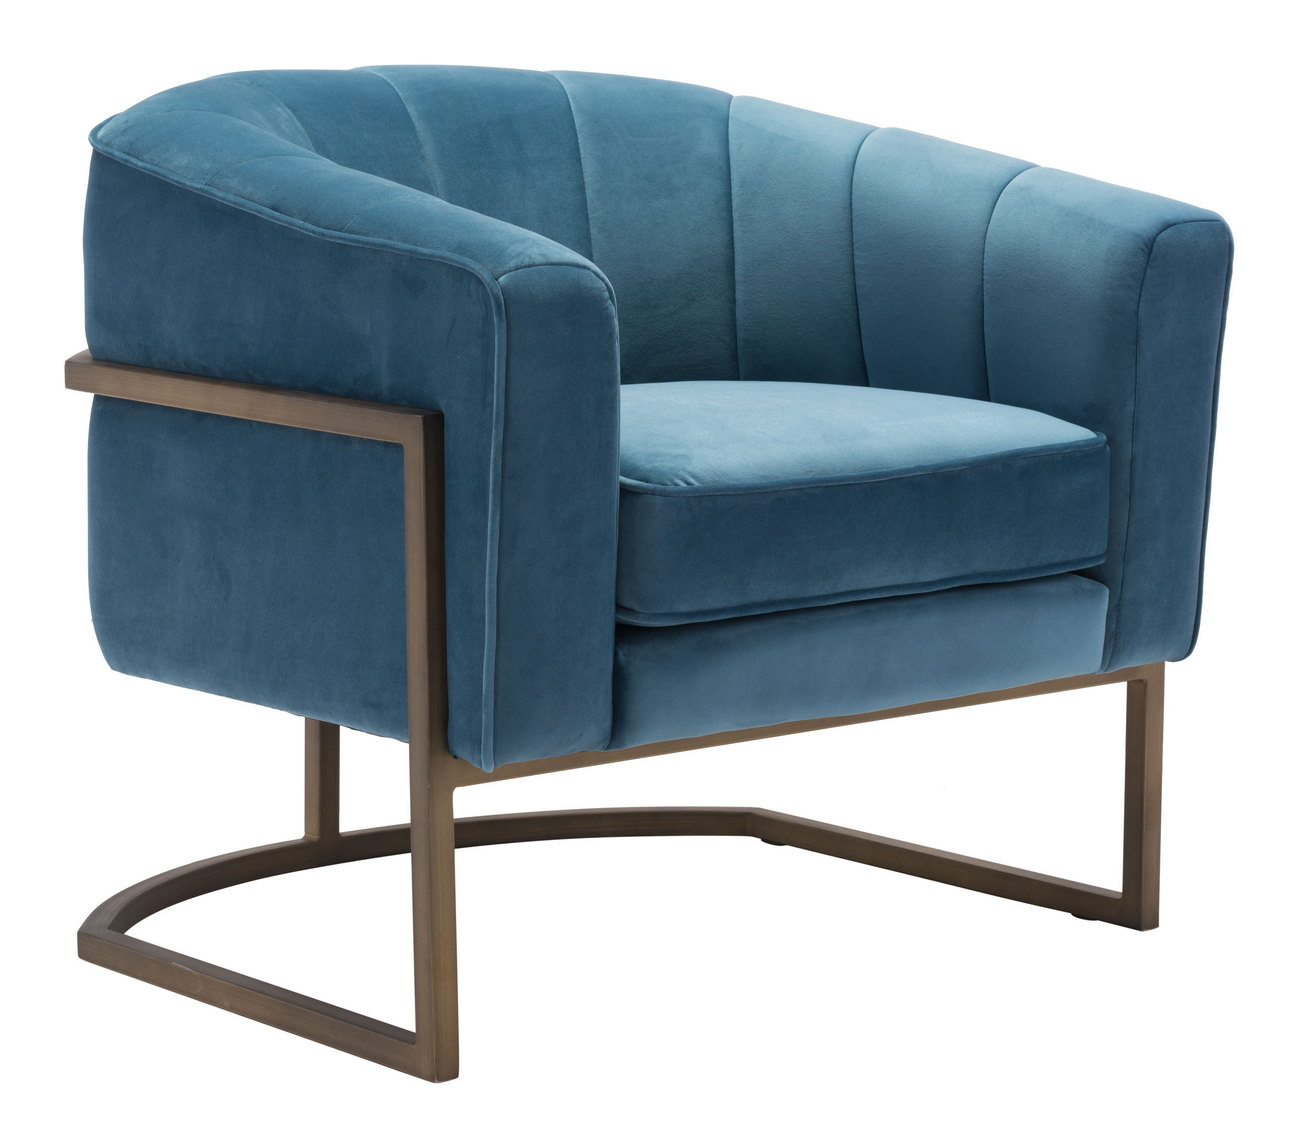 Zuo Lyric Occasional Chair Blue Velvet